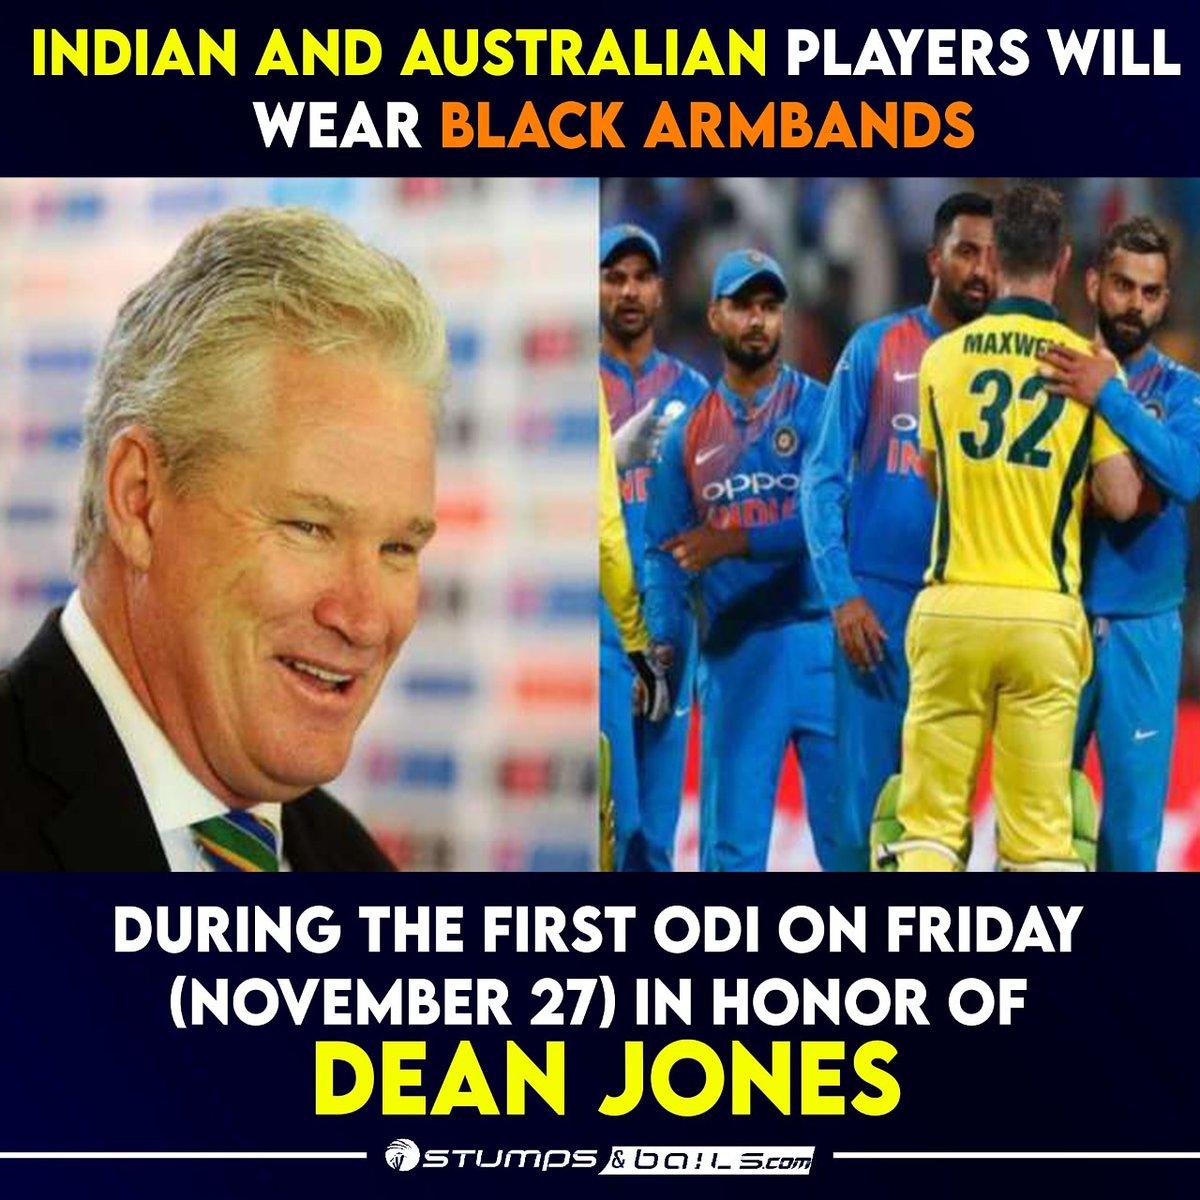 #IndianCricketTeam And #Australiancricketteam will honor late #DeanJones  Follow us @stumpnbails #IndianJersey #IndiavsAustralia #Indiancricketer #IndianCricketTeam #cricketmatch #Cricket #Cricketaustralia #Cricketupdates  #cricketnews #ViratKohli #MayankAgarwal  #DavidWarner